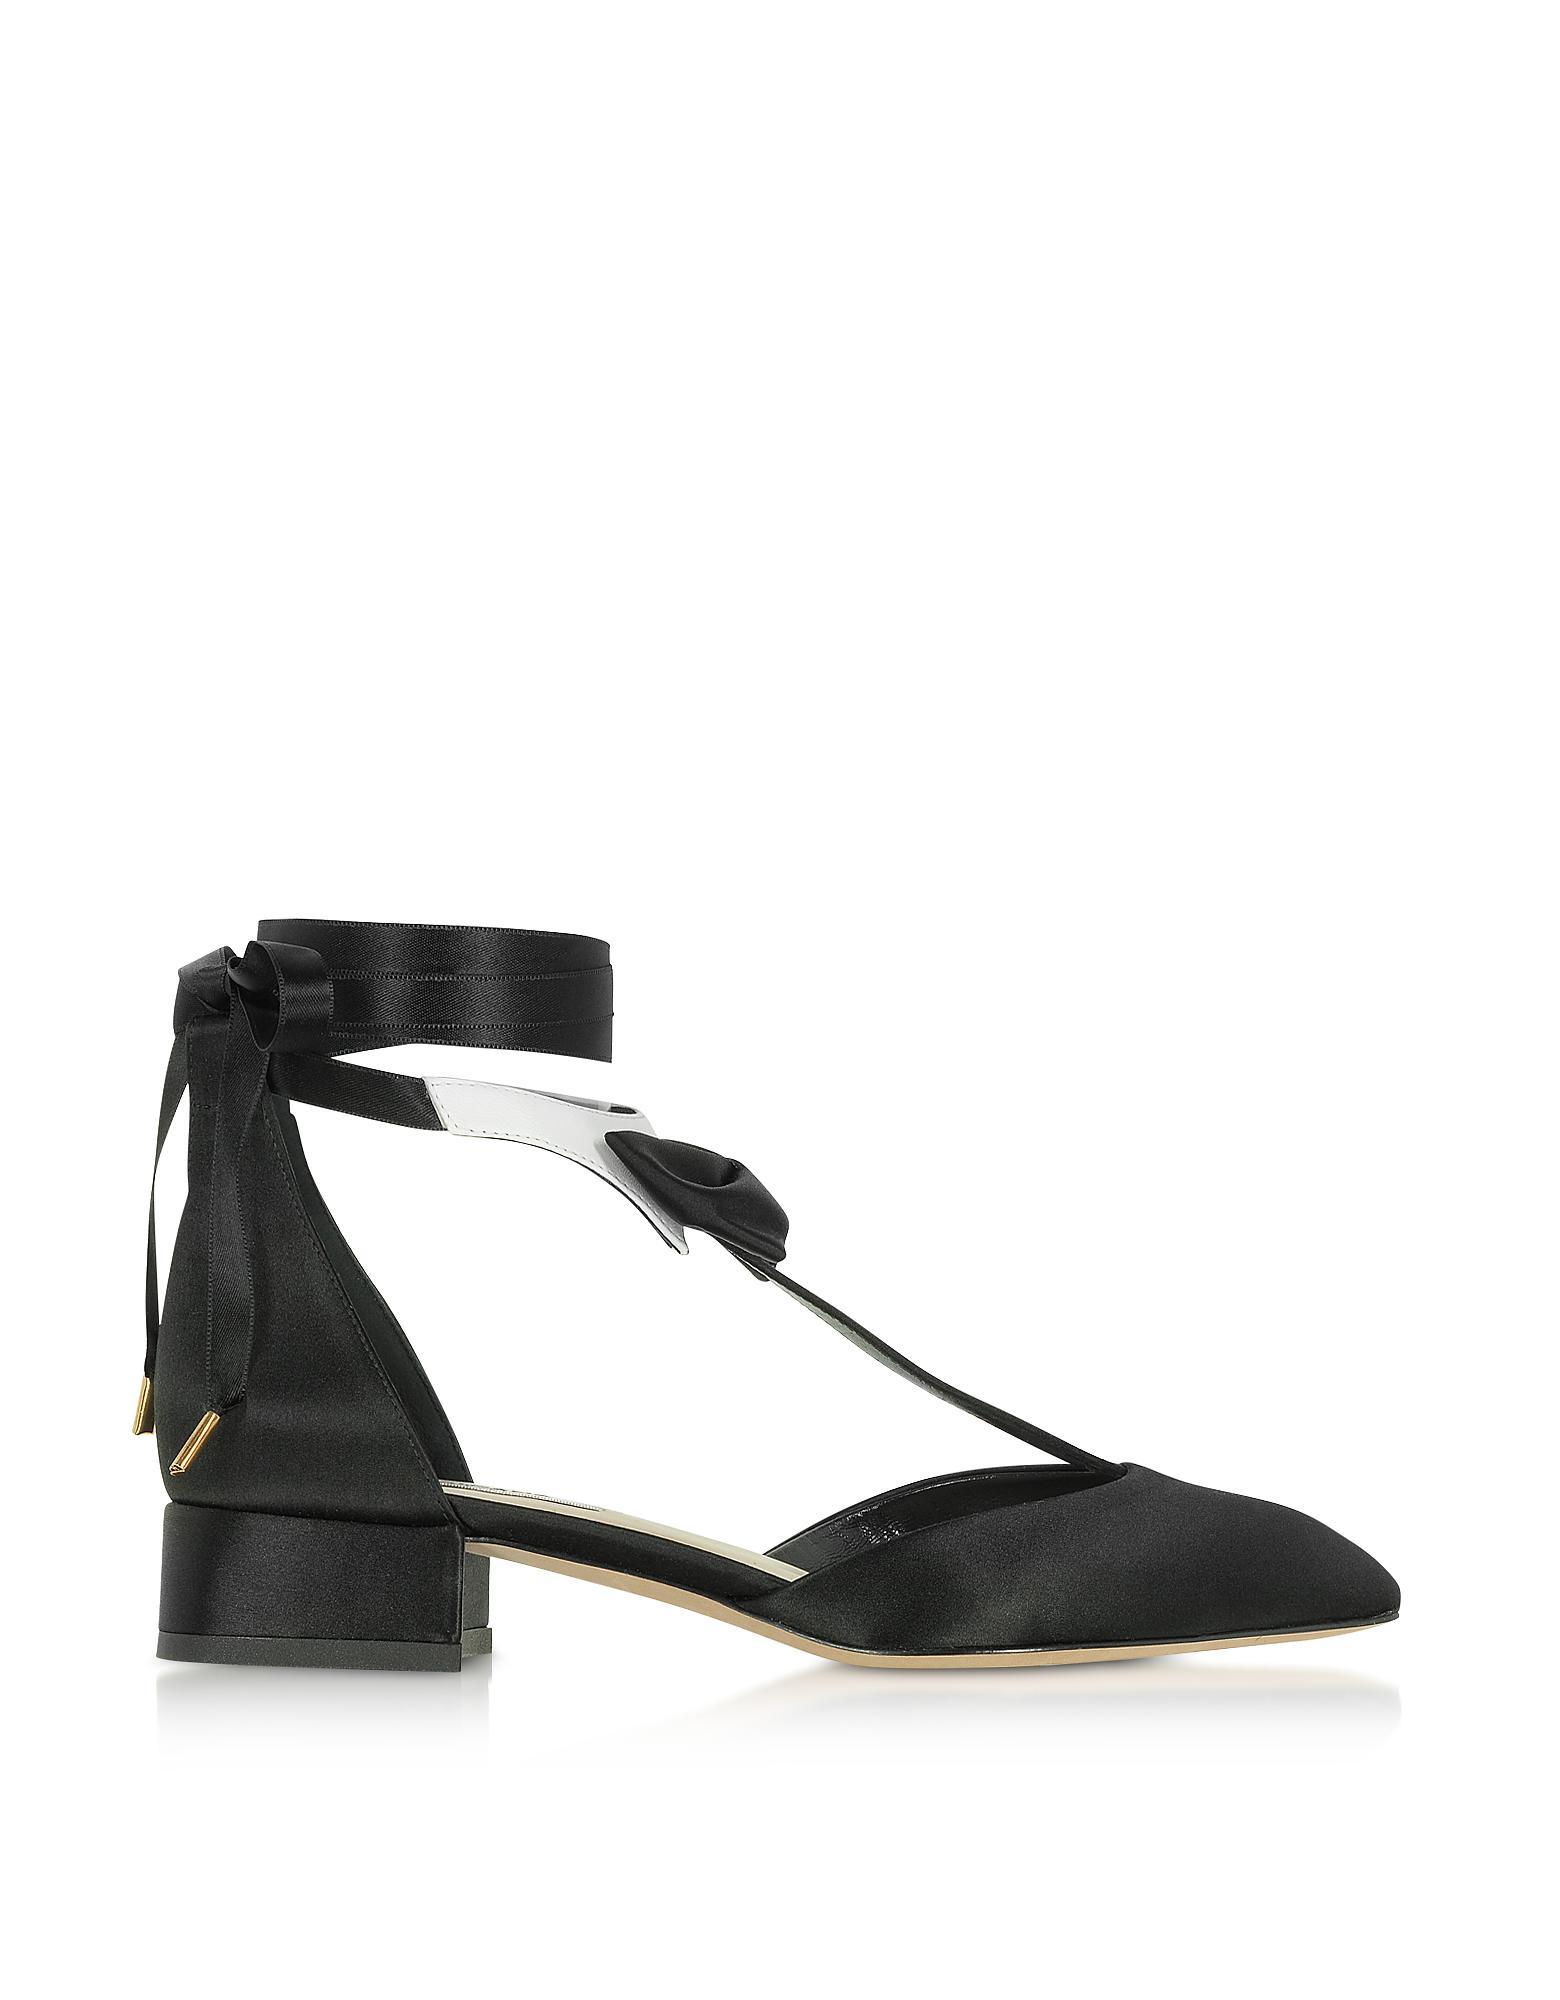 Chaussures - Tribunaux Vagabondes ykx5jNUd5p